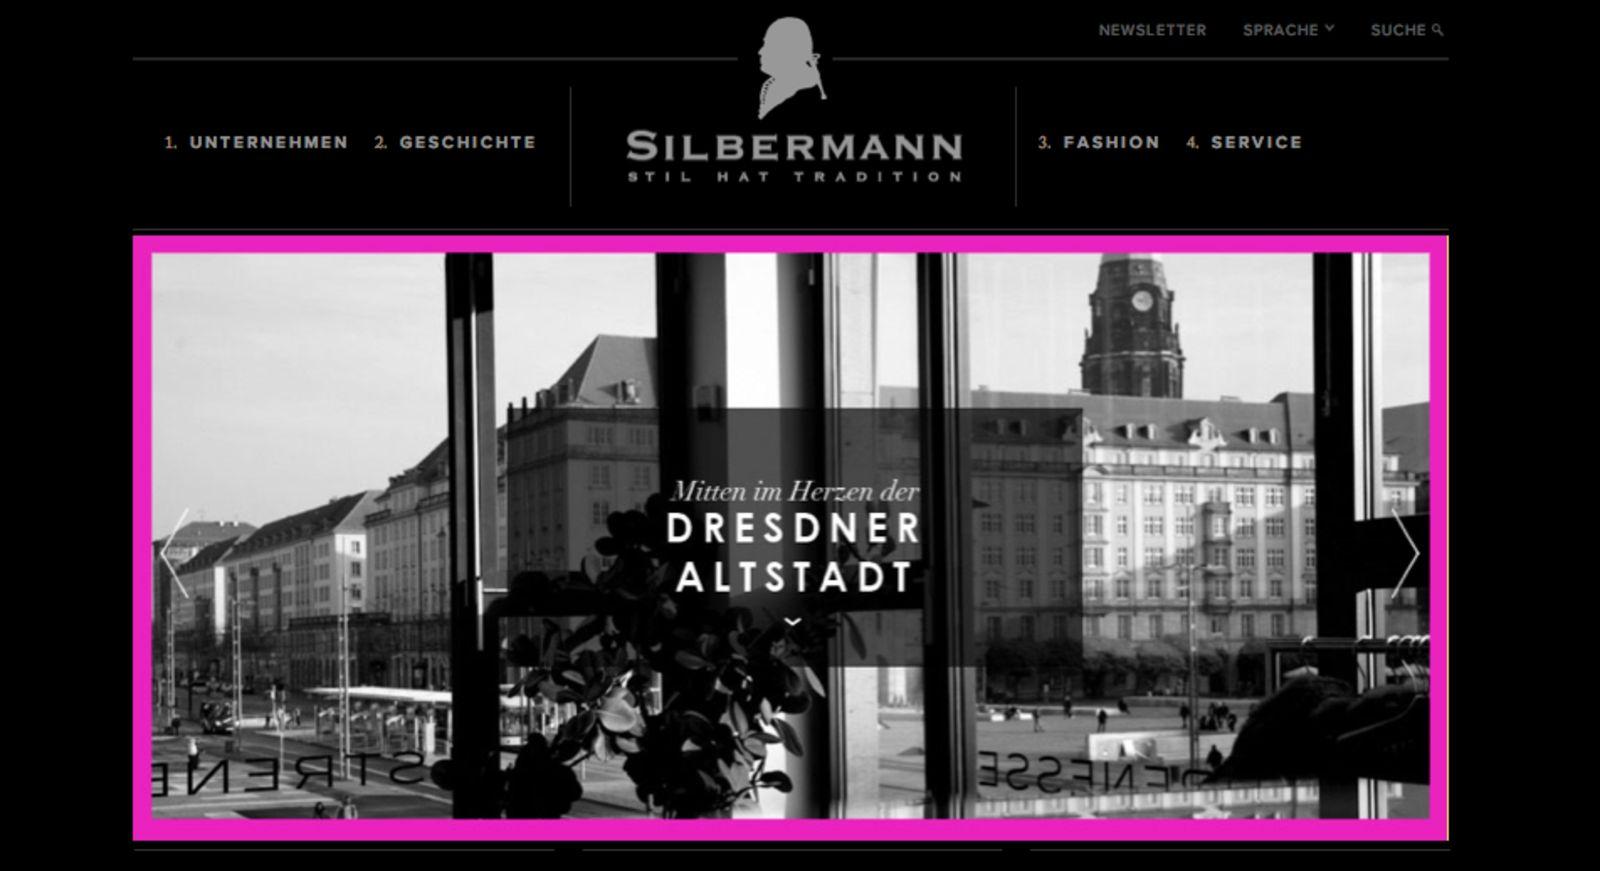 SILBERMANN in Dresden (Bild 1)